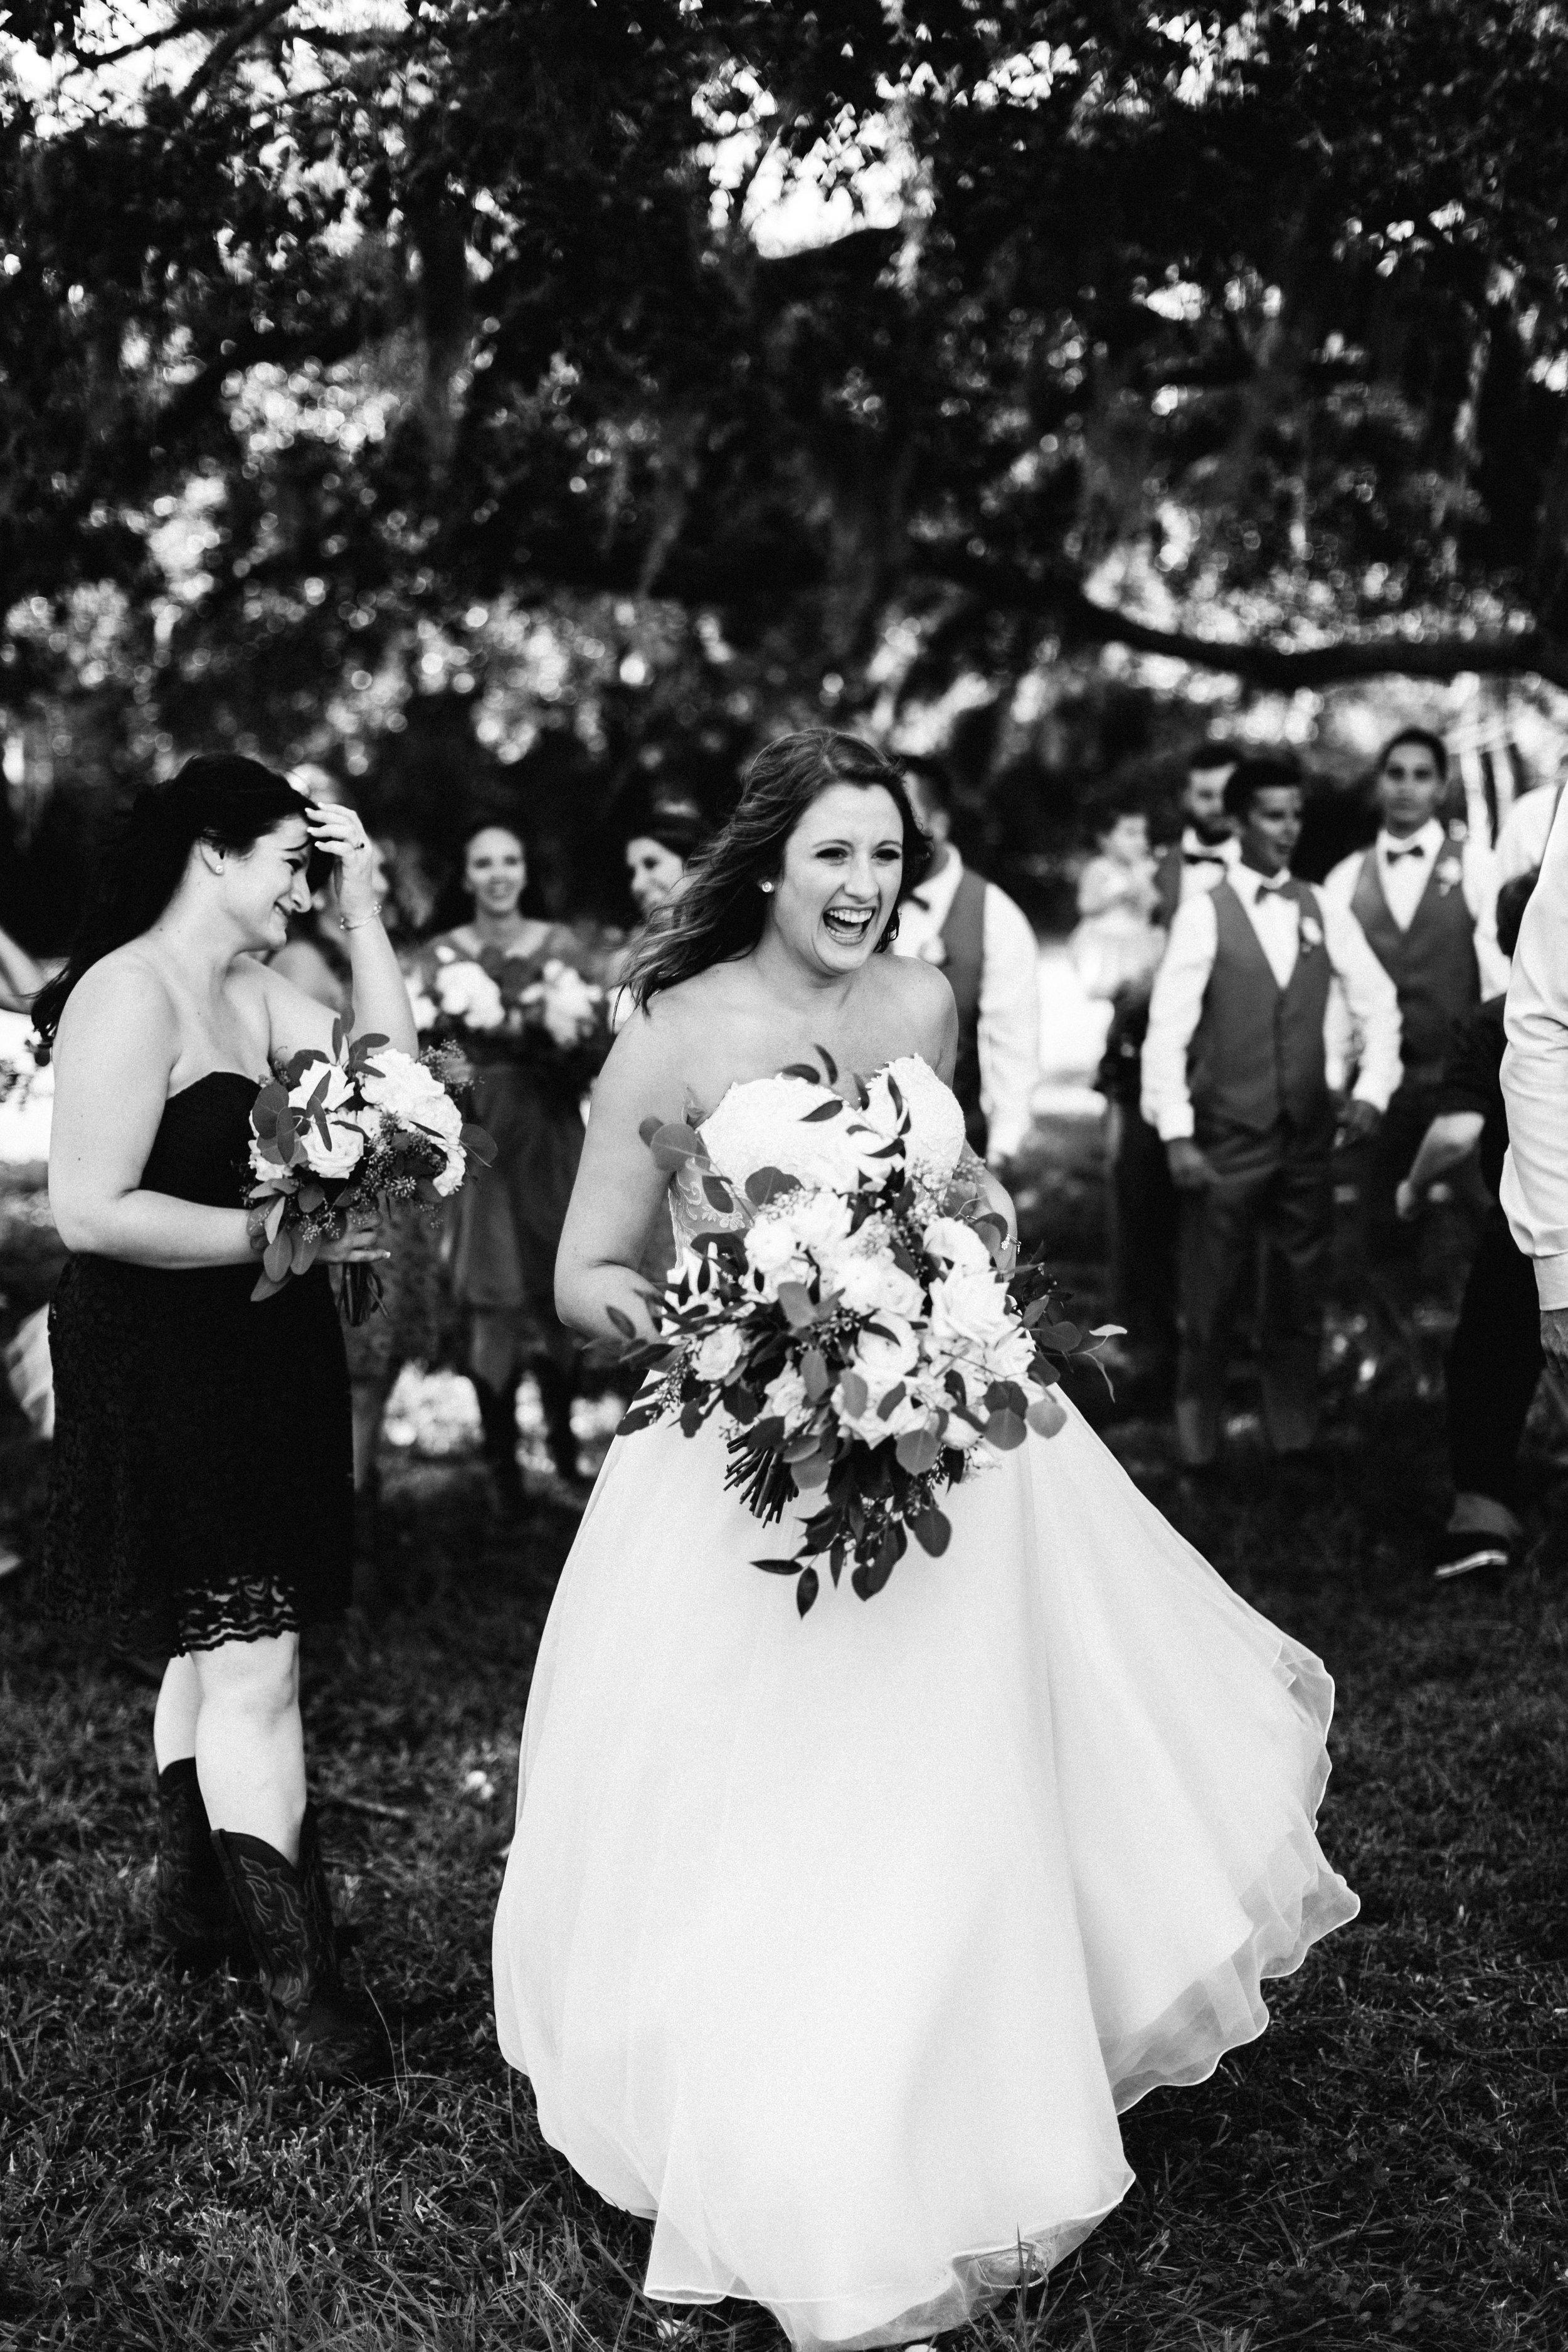 2017.10.14 Samantha and Matthew Crabtree Sarasota Wedding (265 of 708).jpg